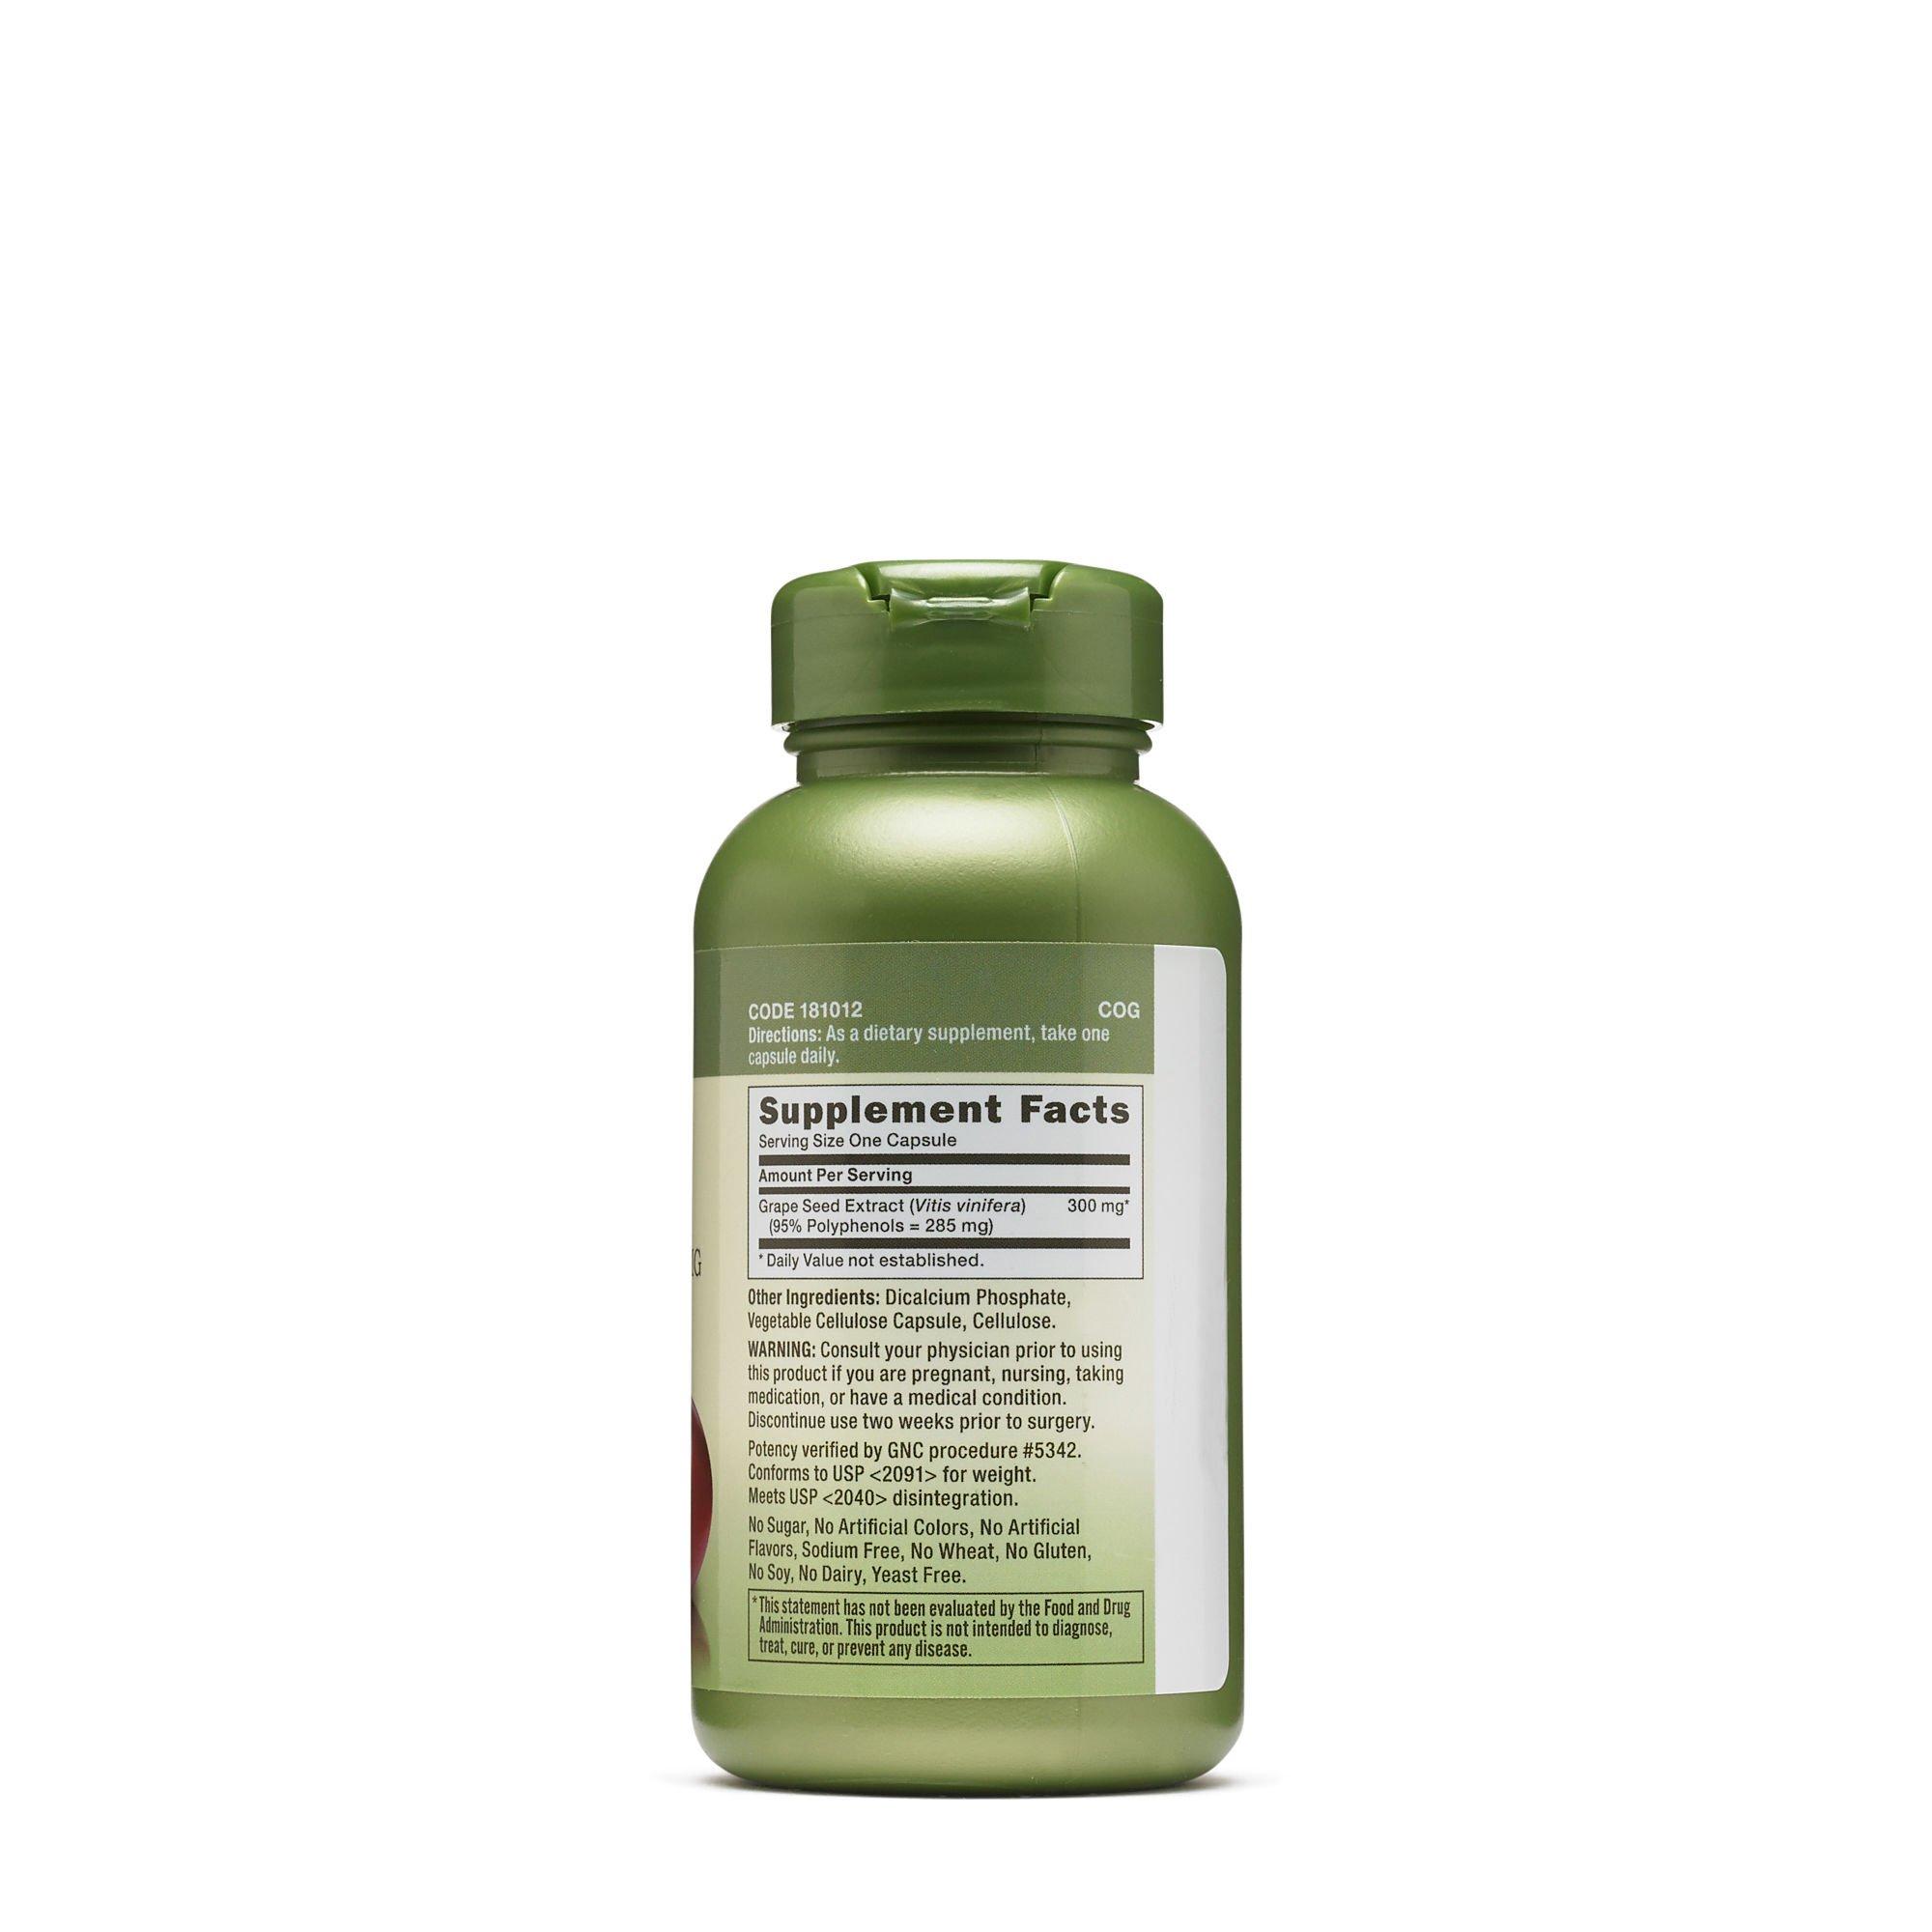 GNC Herbal Plus Grape Seed Extract 300 mg, 100 Capsules, 2 Pack, 200 Total Capsules